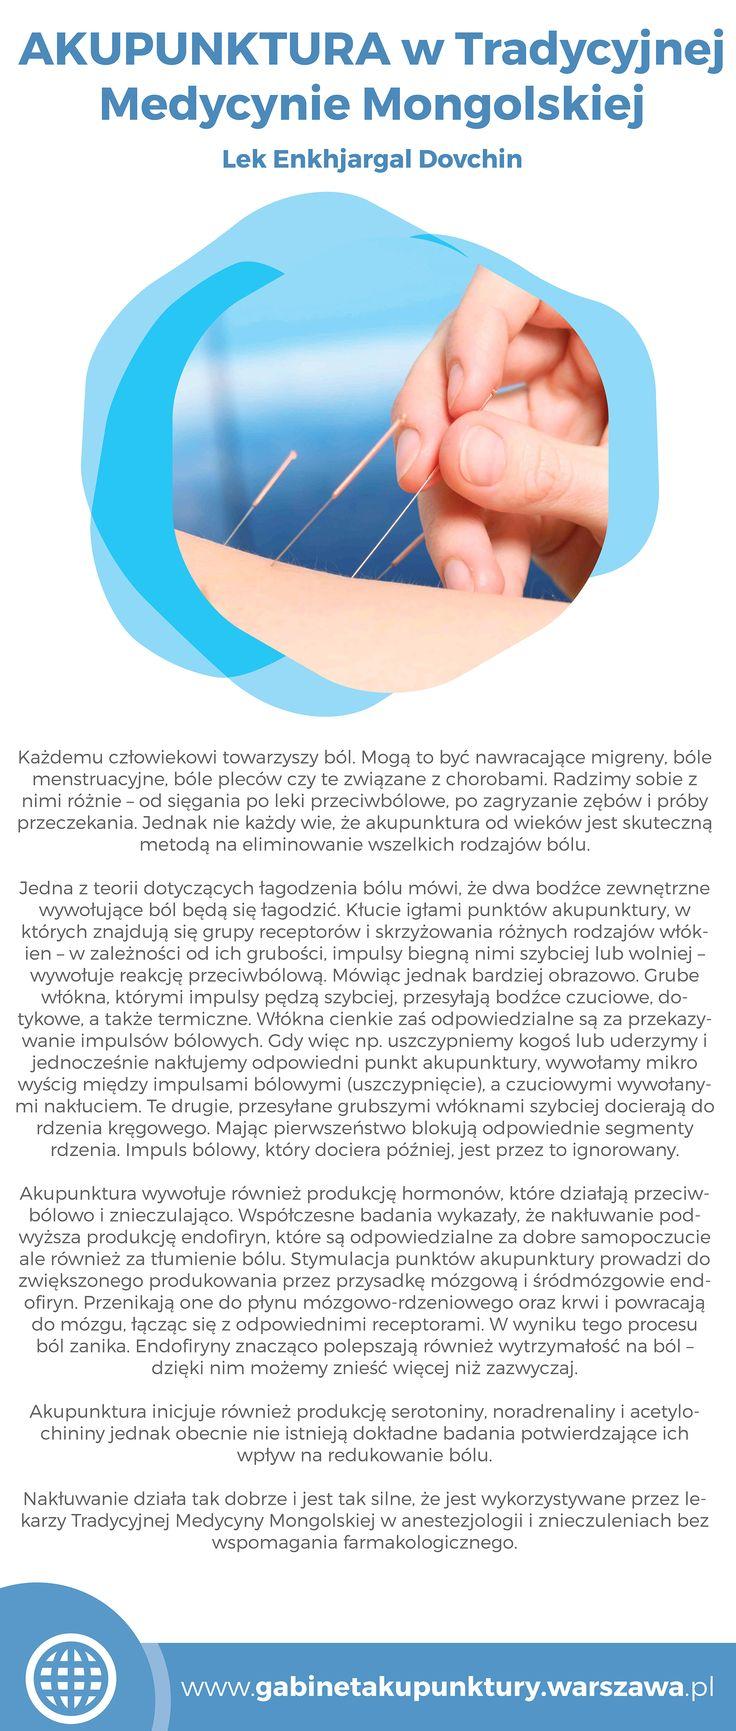 Gabinet Akupunktury prof Enkhjargal Dovchin [ www.gabinetakupunktury.warszawa.pl